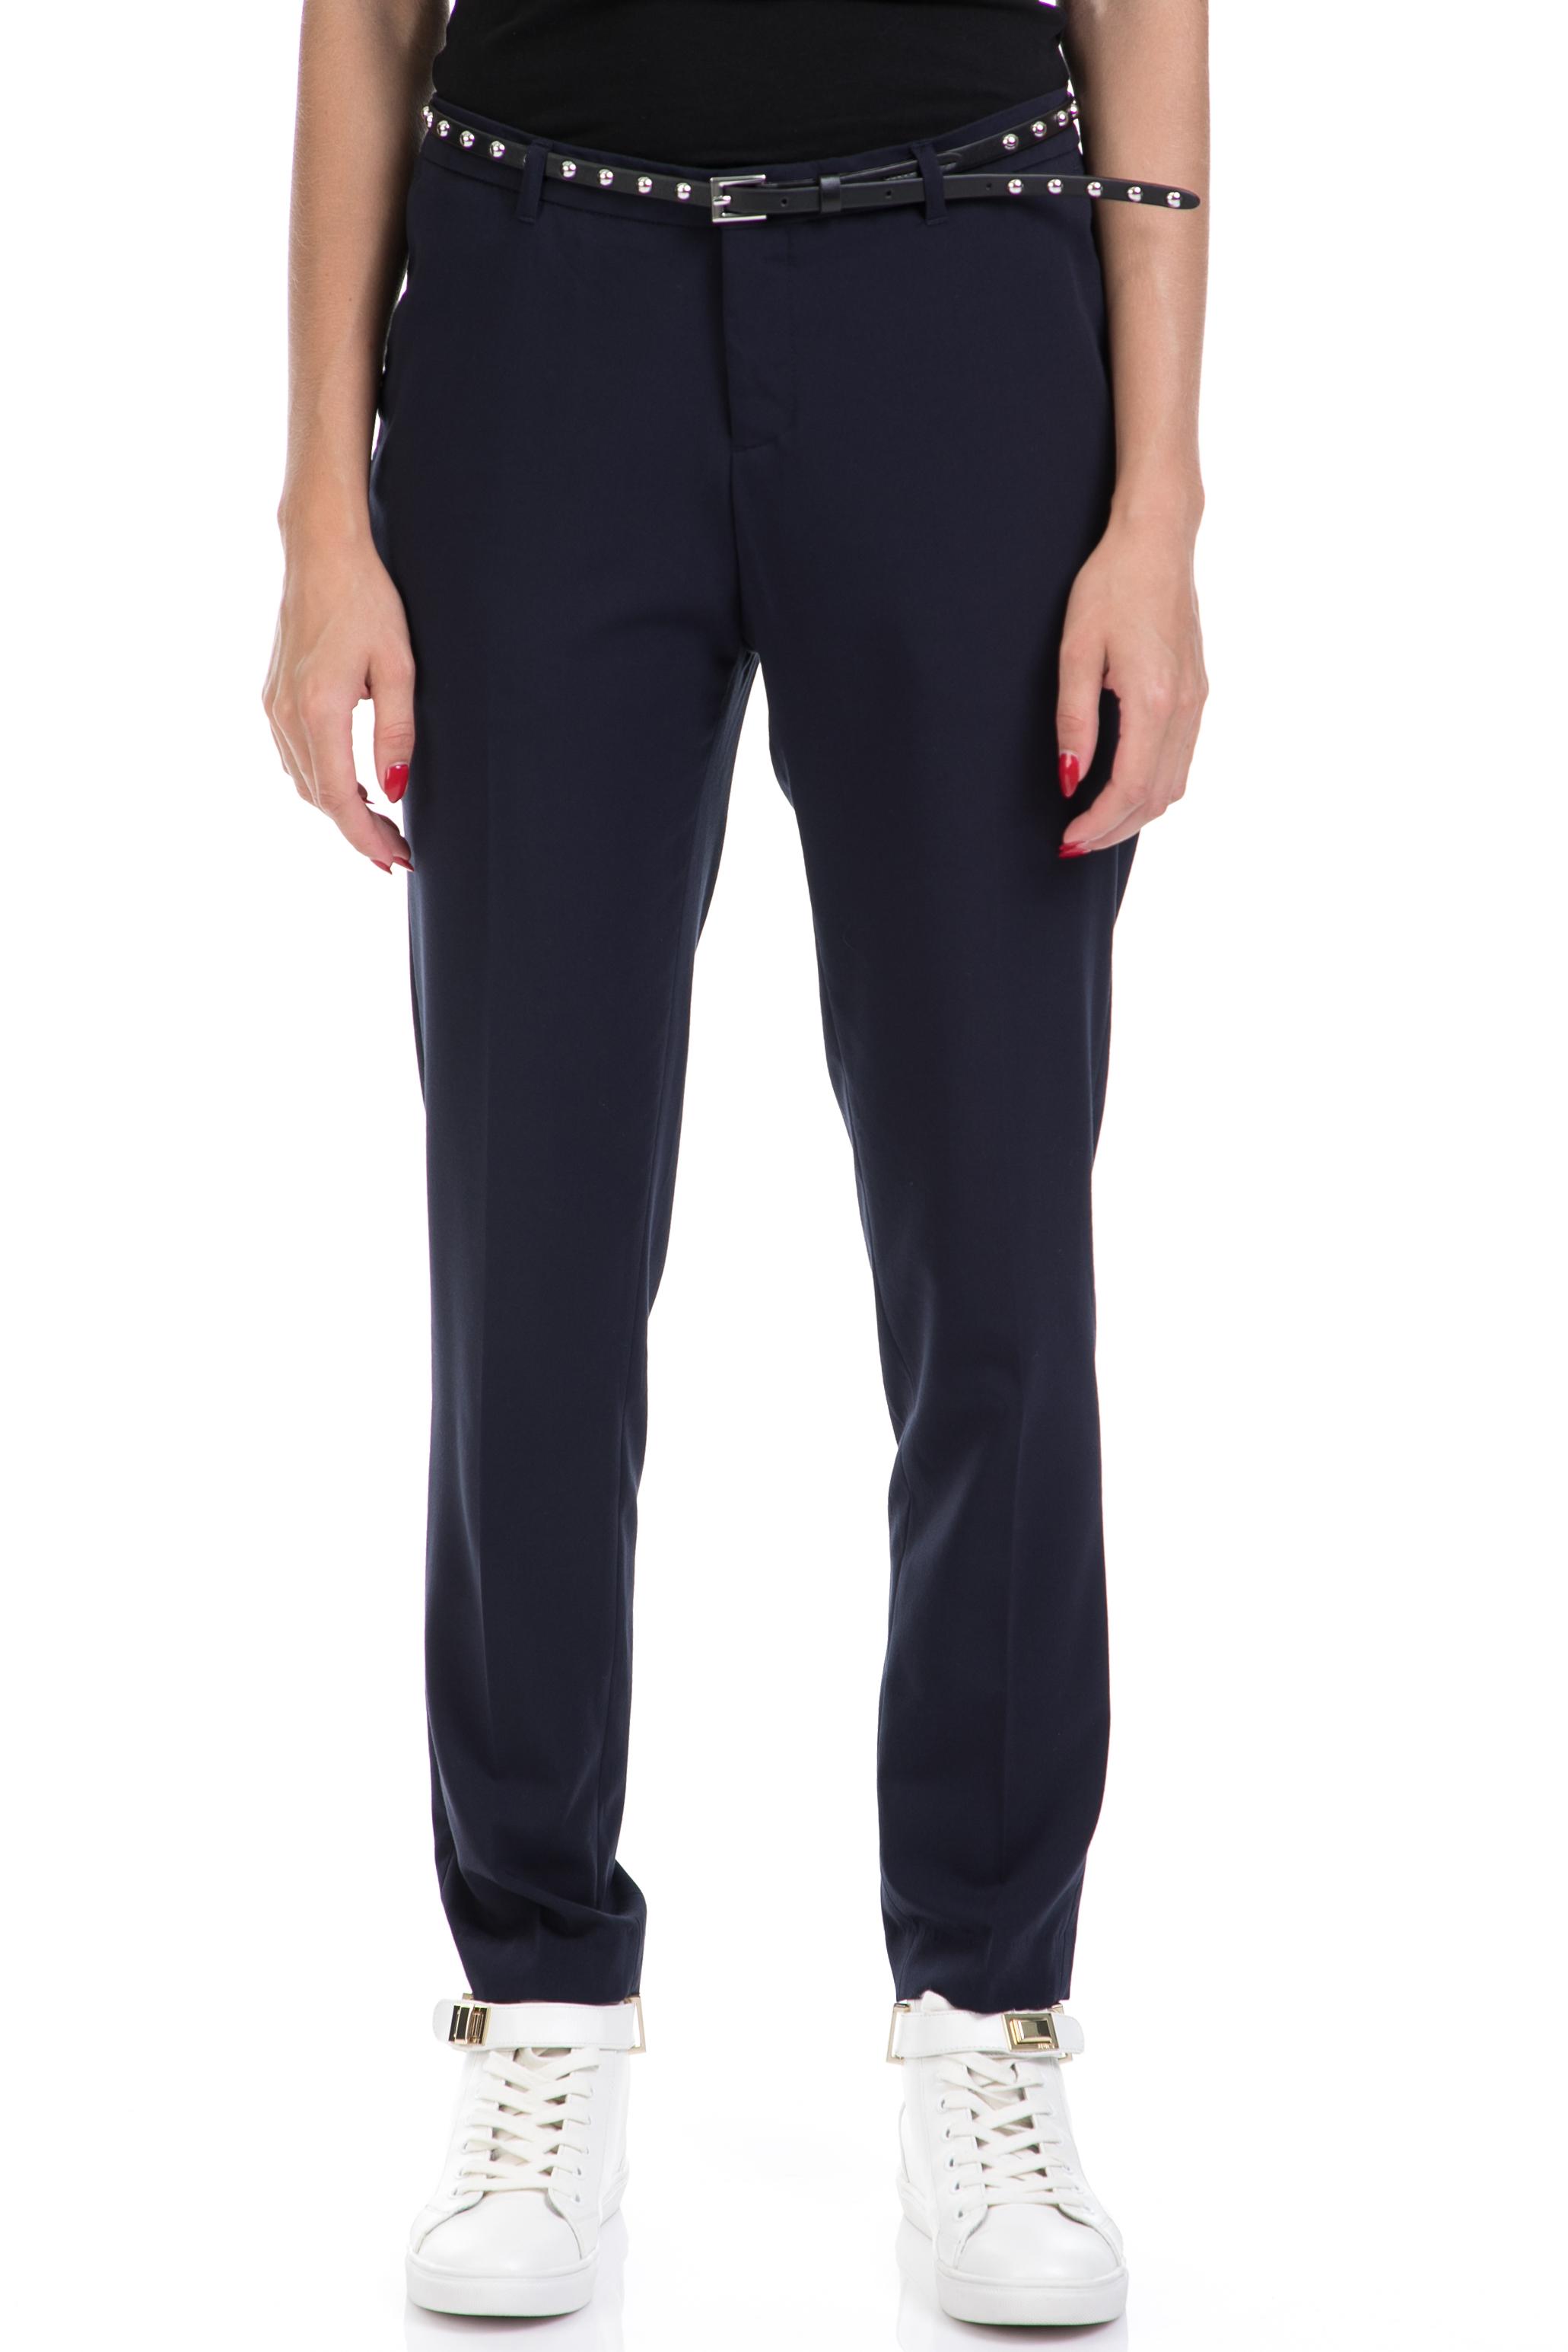 SCOTCH & SODA - Γυναικείο παντελόνι MAISON SCOTCH μπλε γυναικεία ρούχα παντελόνια